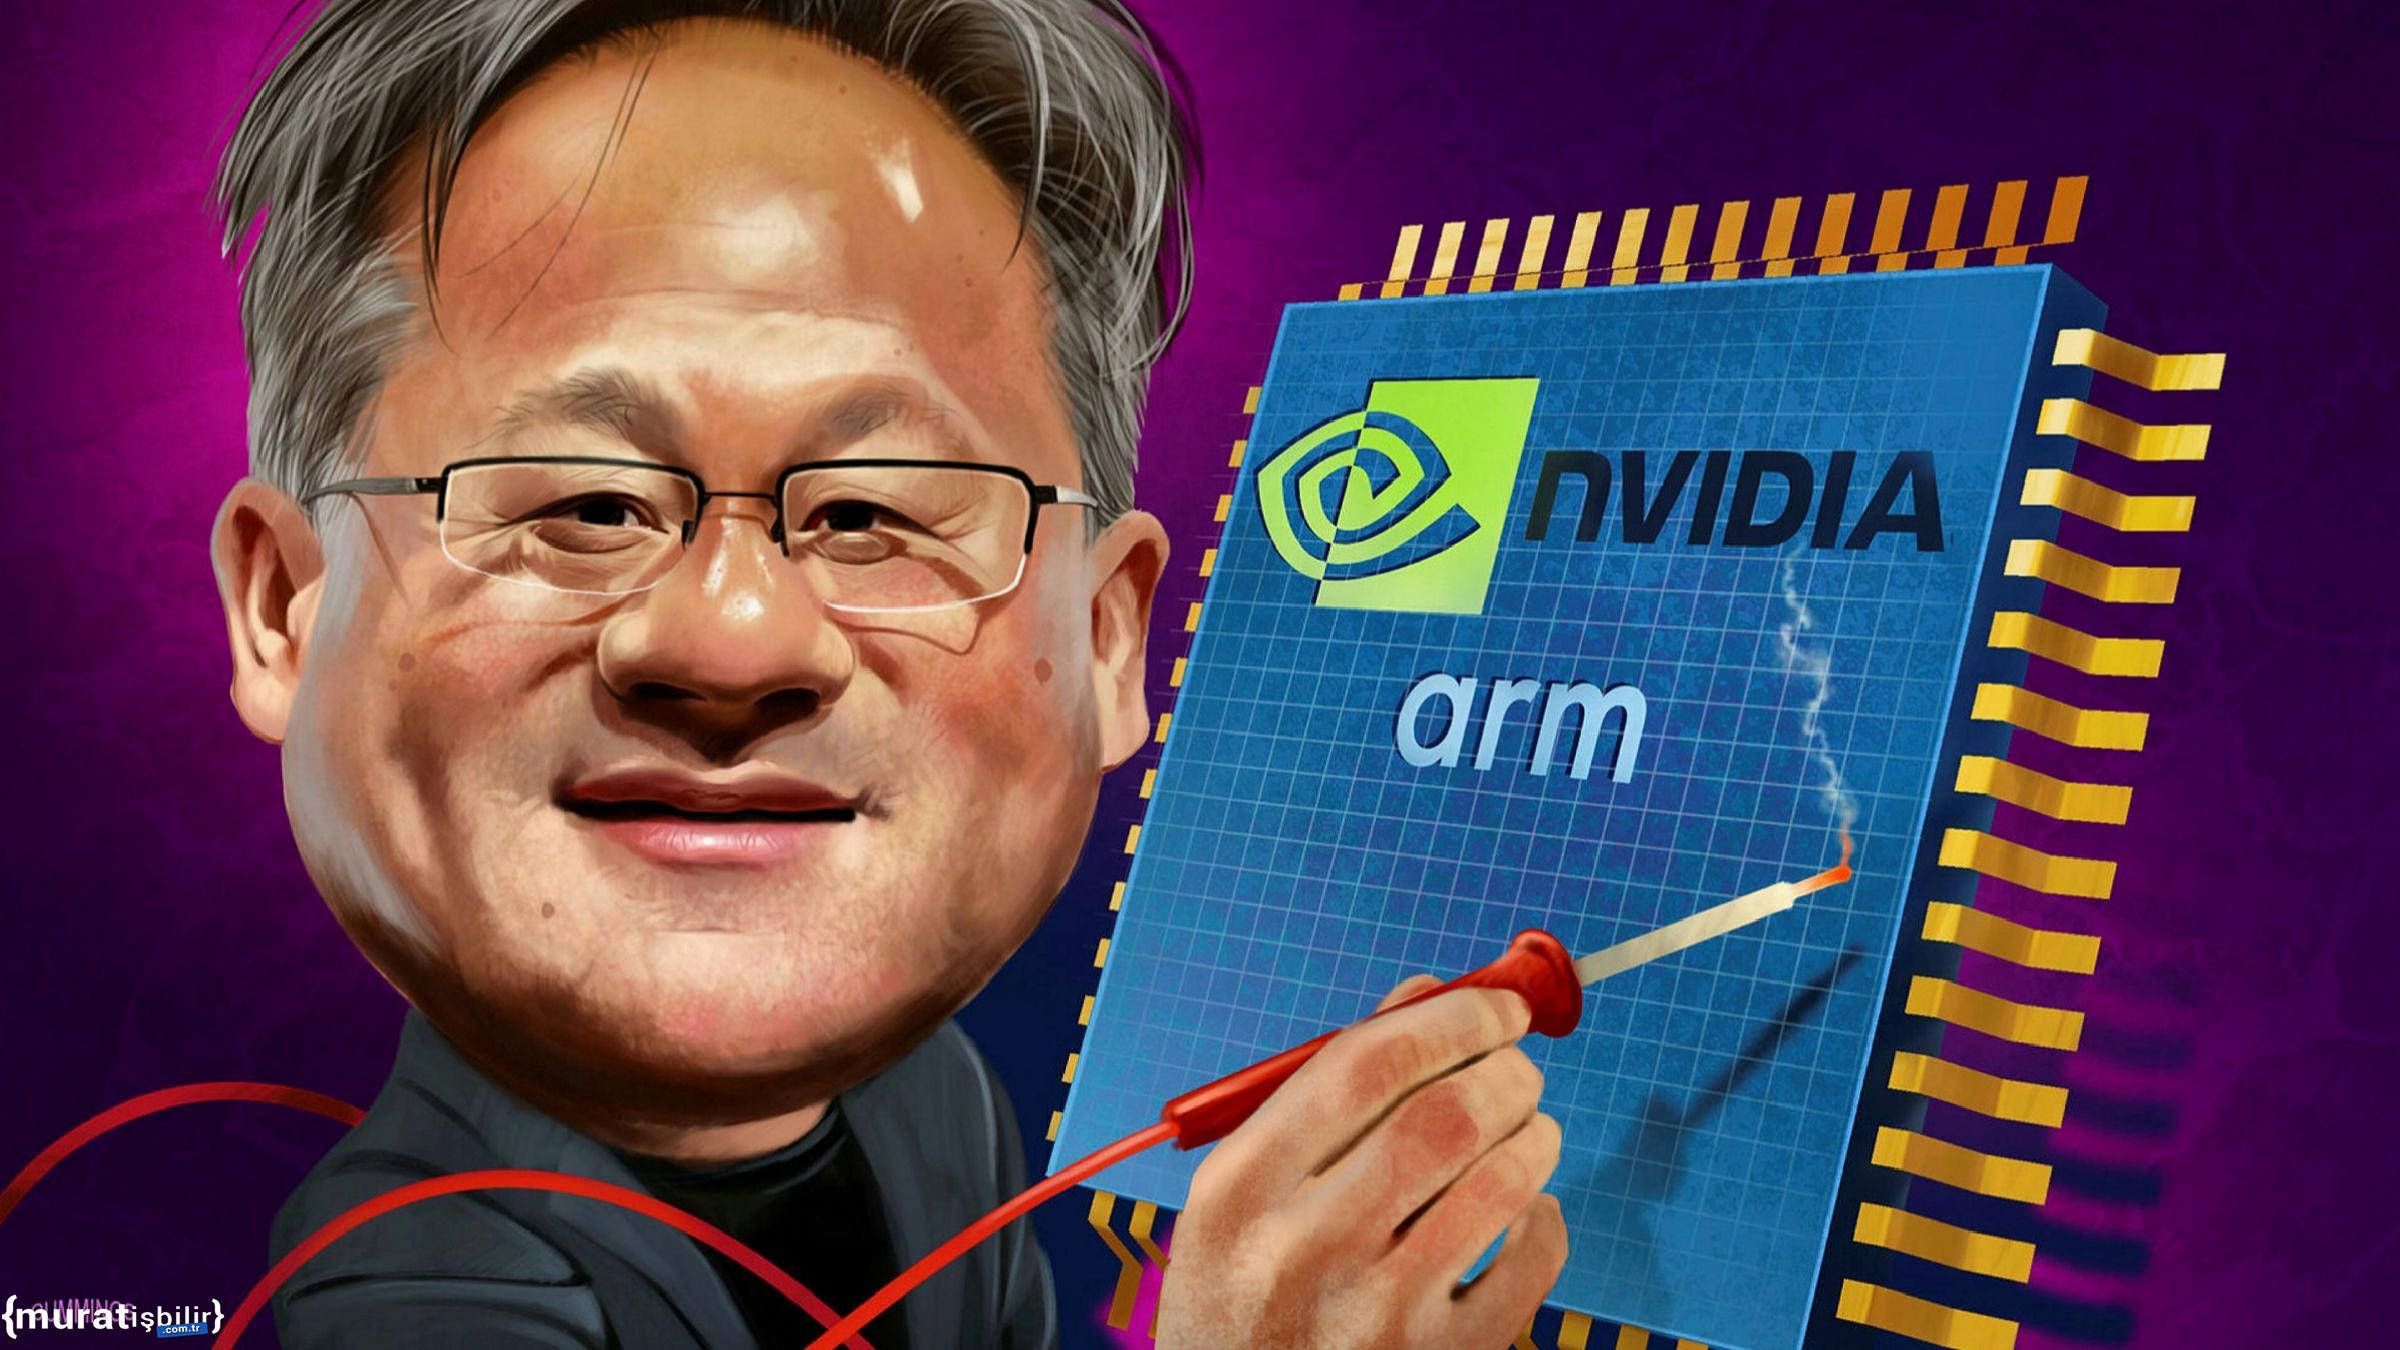 NVIDIA CEO'su Huang, TIME Dergisinin Kapağında Yer Alacak